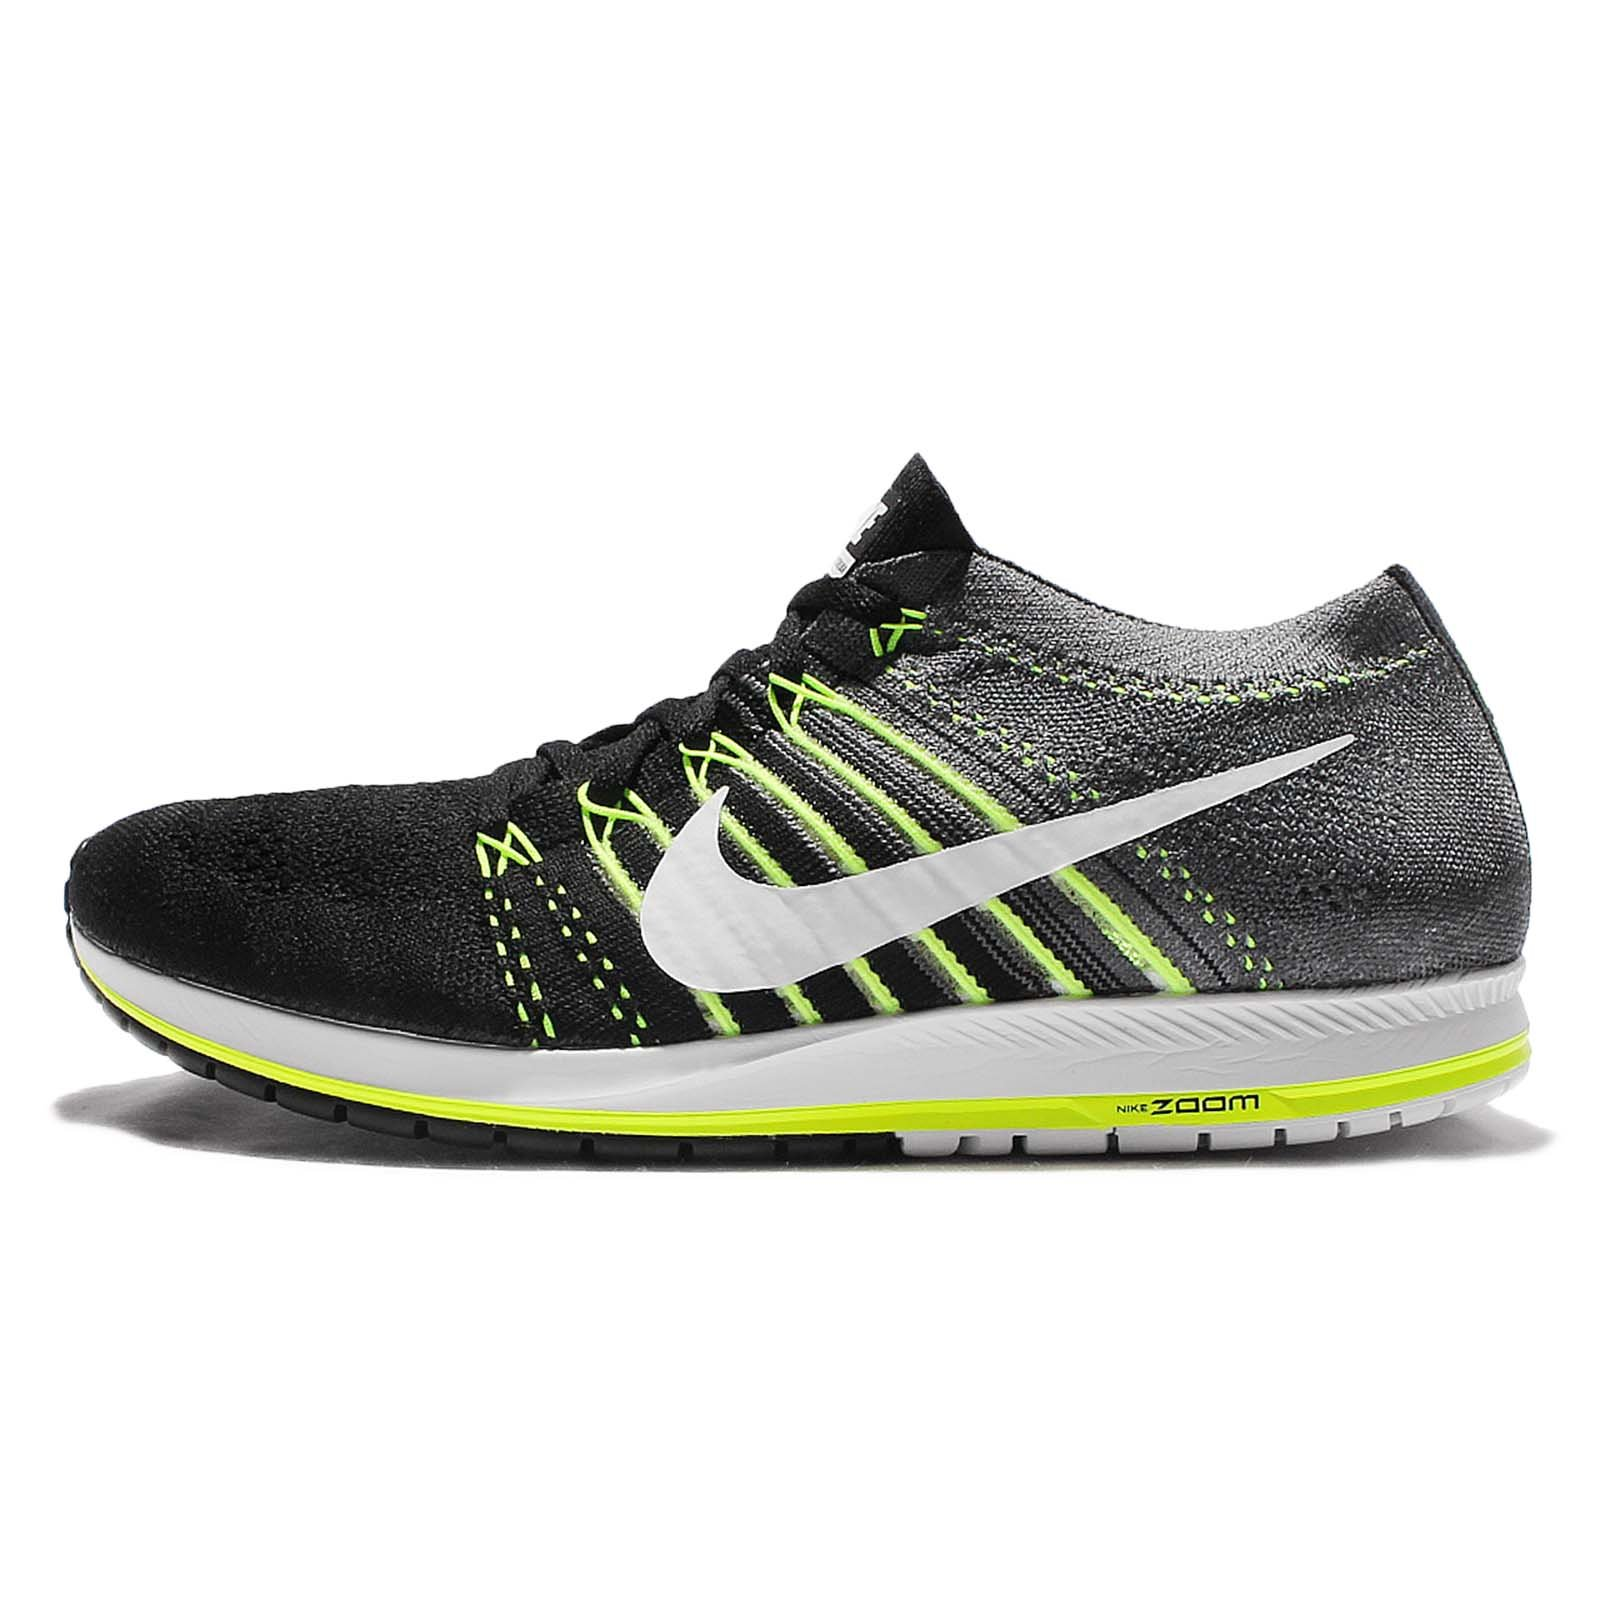 809161e19bb4 Galleon - Nike Flyknit Streak Running Shoes Black White Dark Grey Volt 835994  001